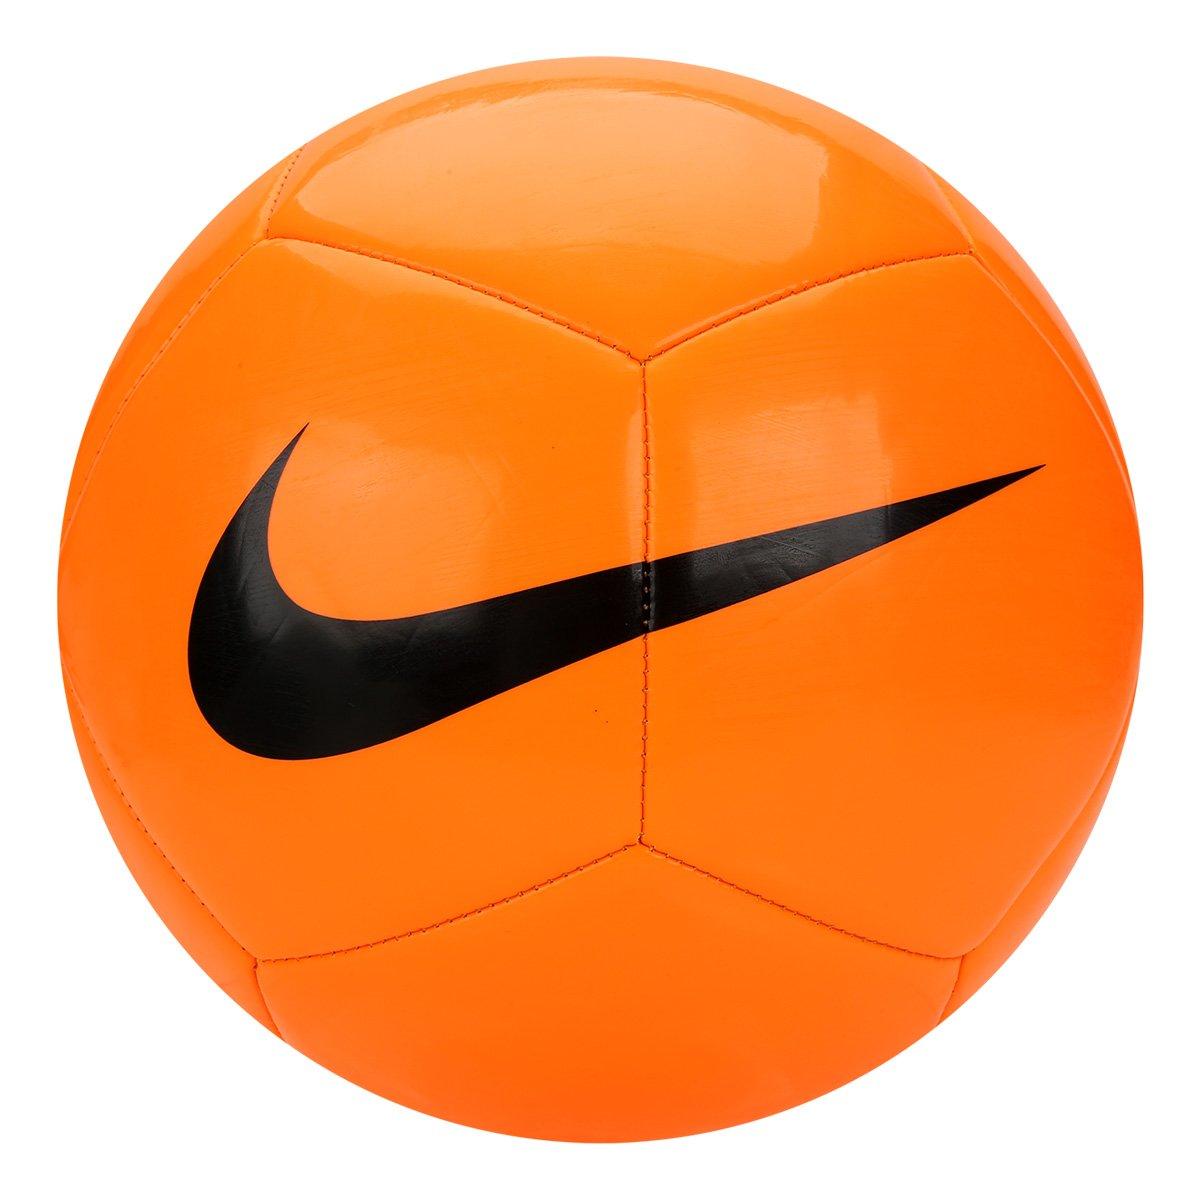 8448d746f234d Bola Futebol Campo Nike Pich Team - Laranja e Preto - Compre Agora ...